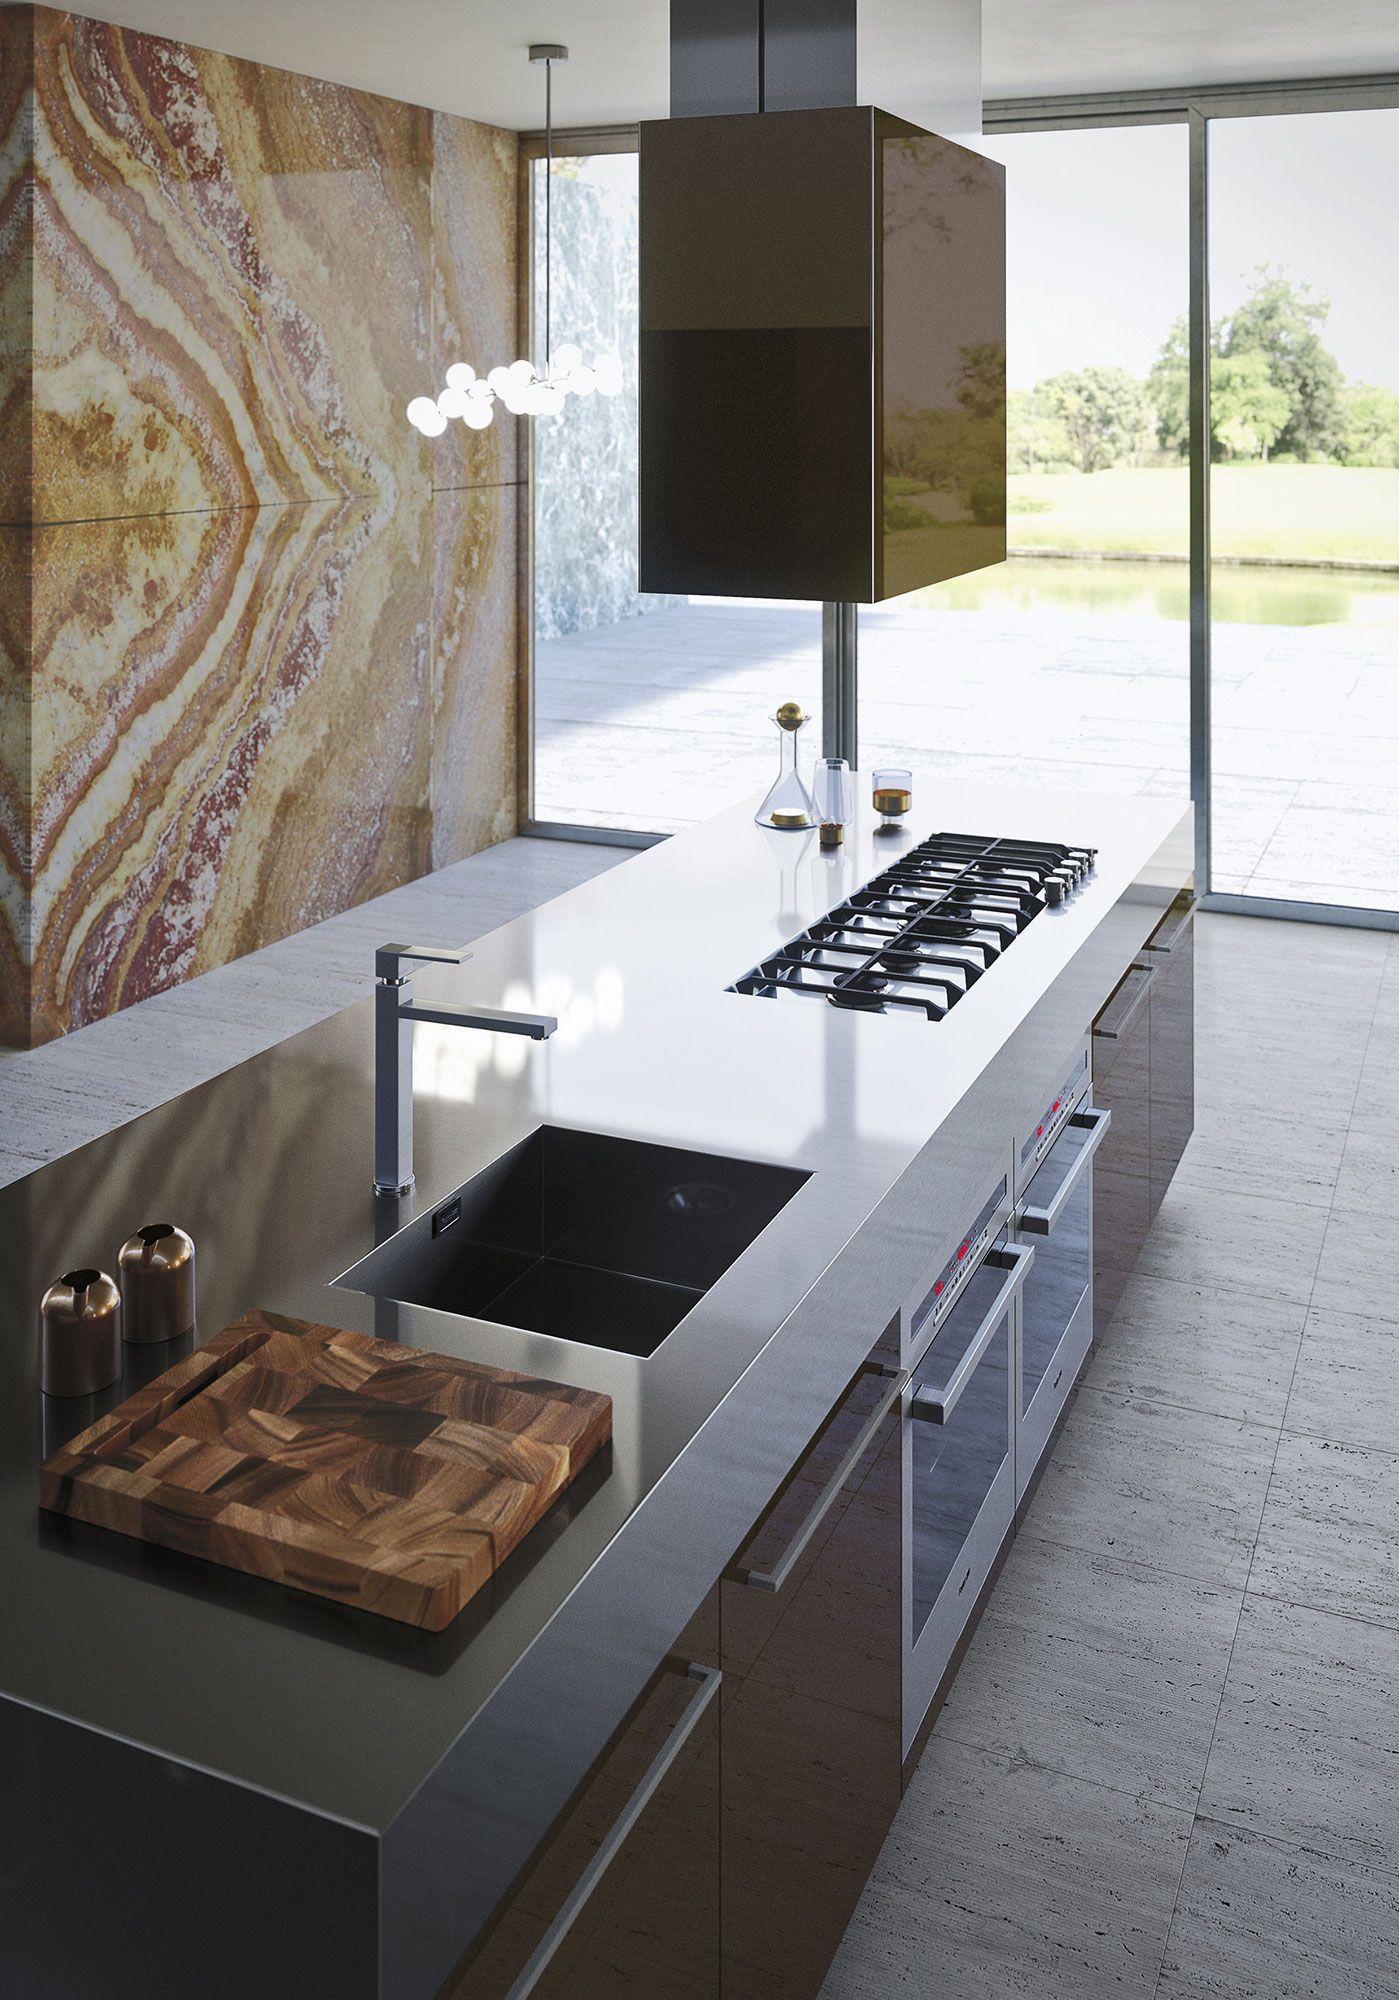 Deco Salle De Bain Beige Et Marron ~ Opera Collection System Authentic Kitchens From Snaidero Walls